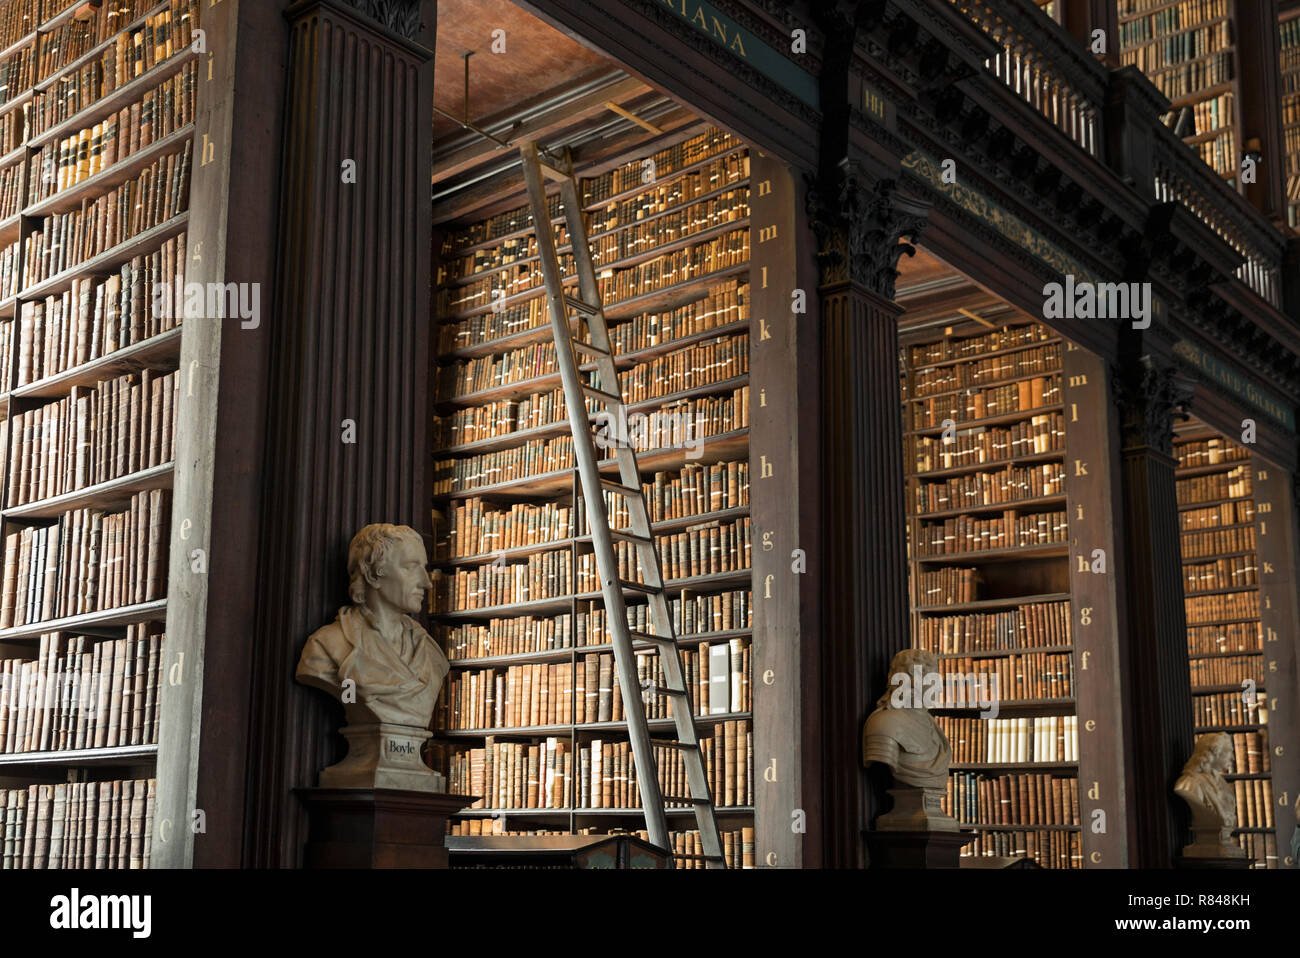 Ireland Dublin Trinity College Dublin Book Of Kells Old